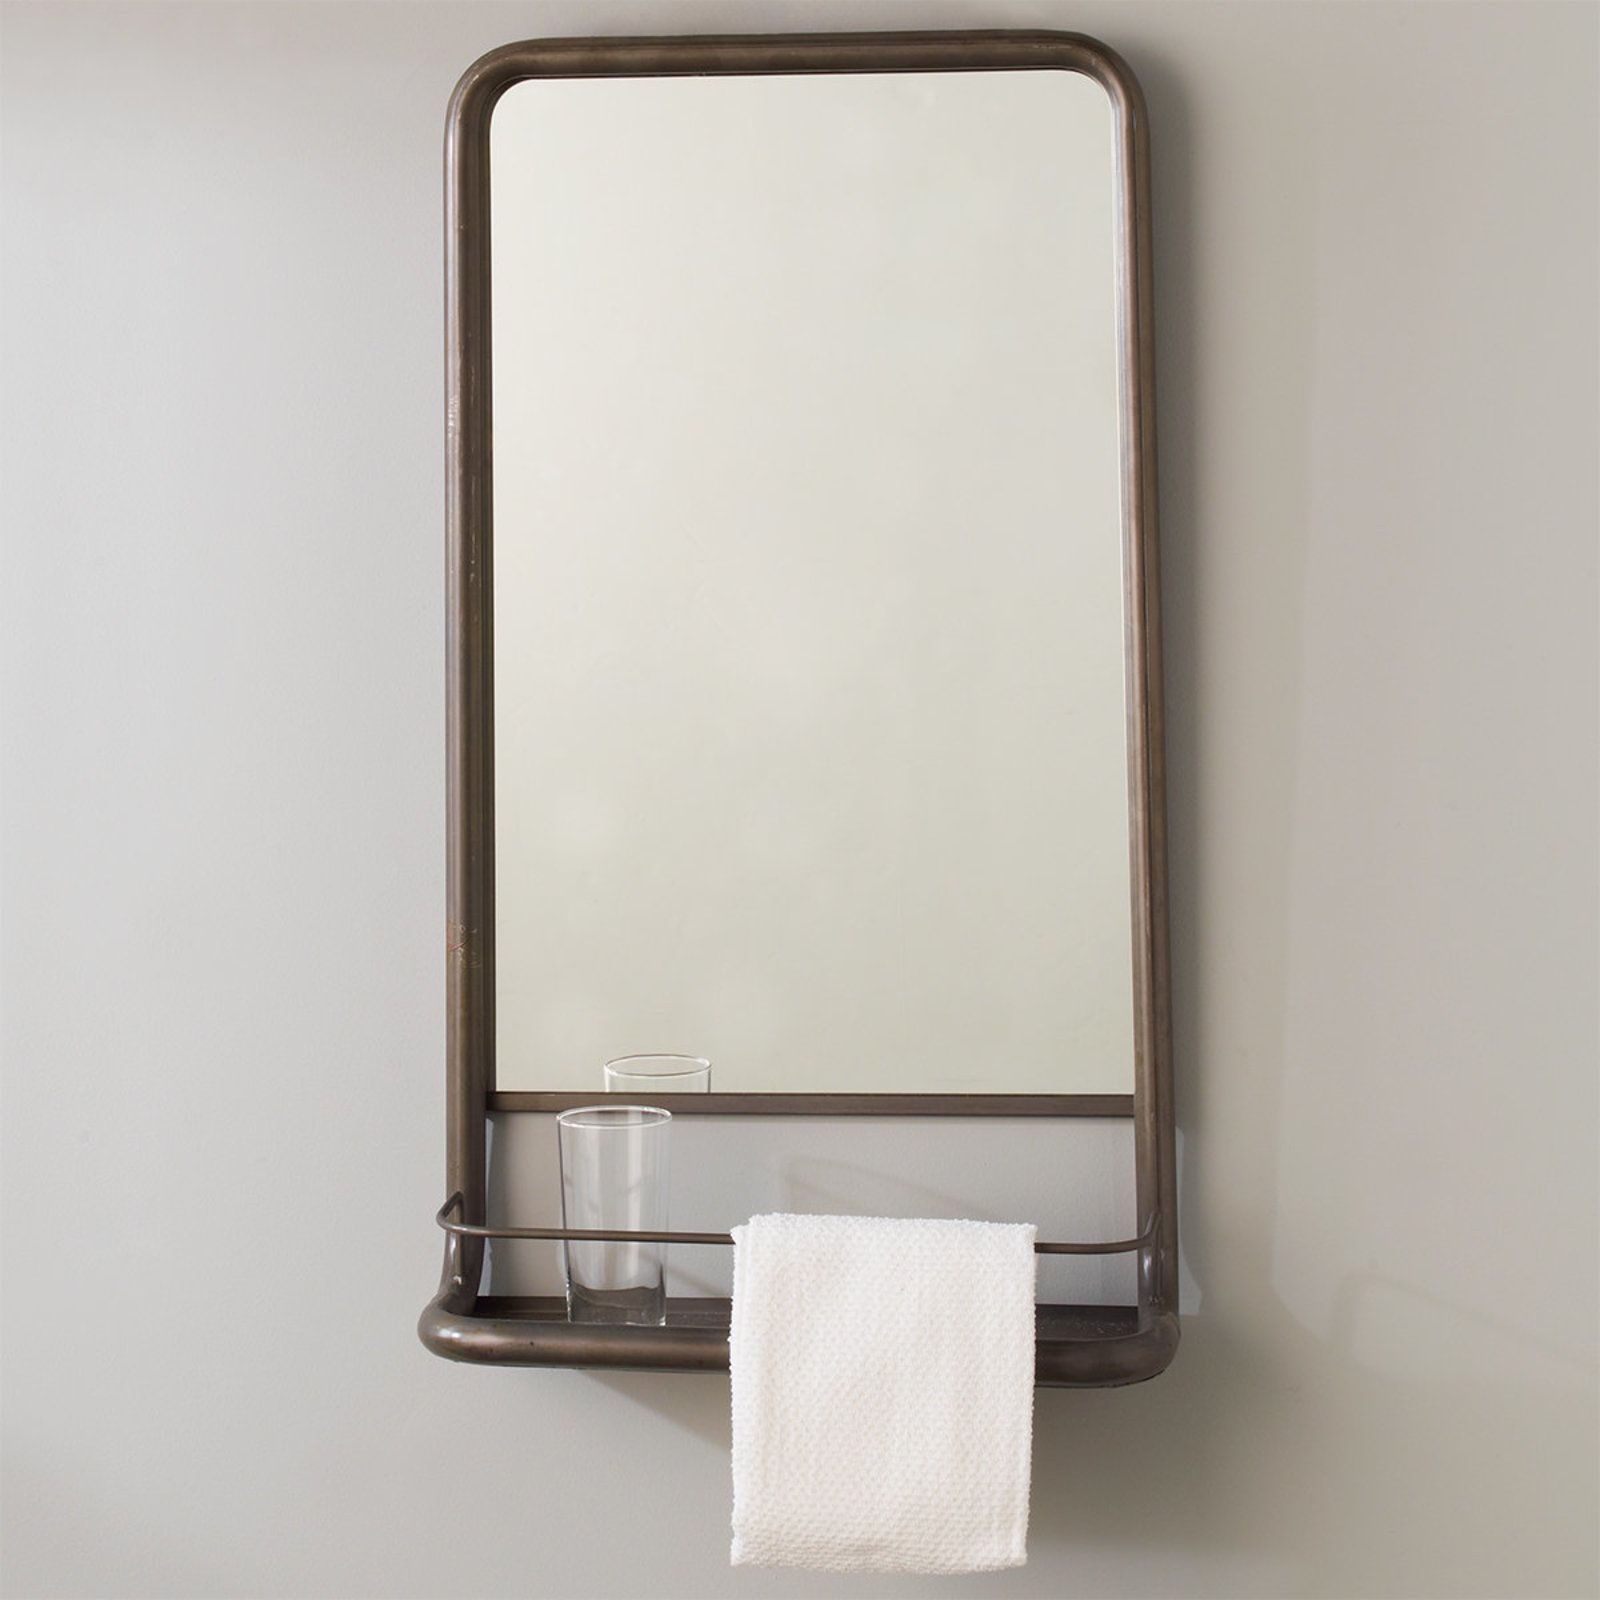 Metal Mirror With Shelf Small Industrial Mirrors Metal Mirror Contemporary Bathroom Remodel